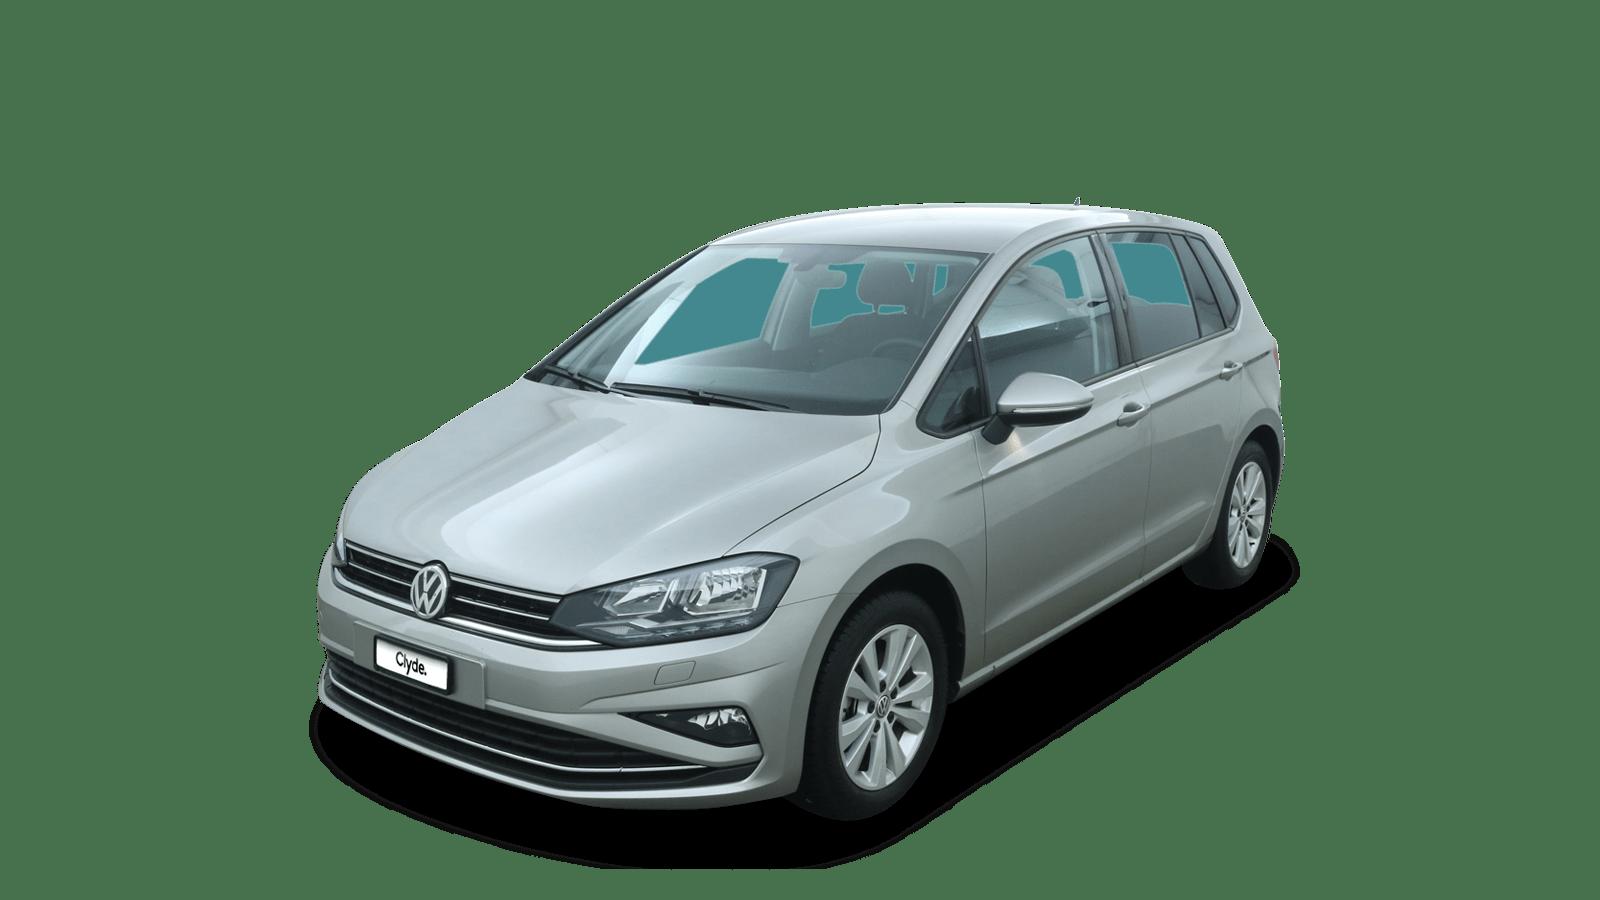 VW Golf Sportsvan Silber front - Clyde Auto-Abo